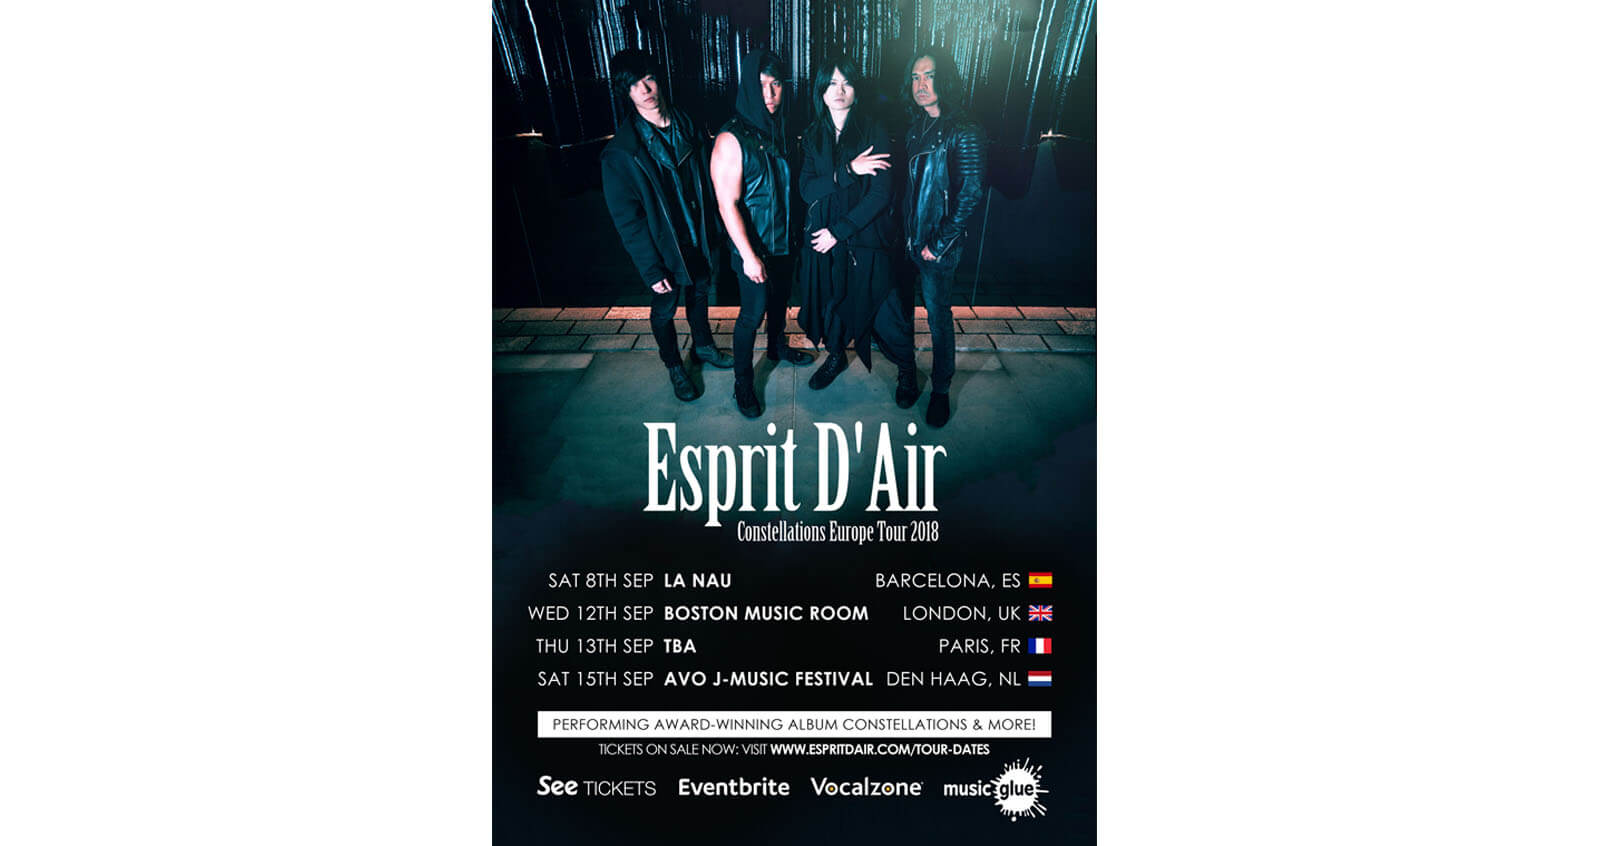 Esprit D'Air Europe Tour Poster